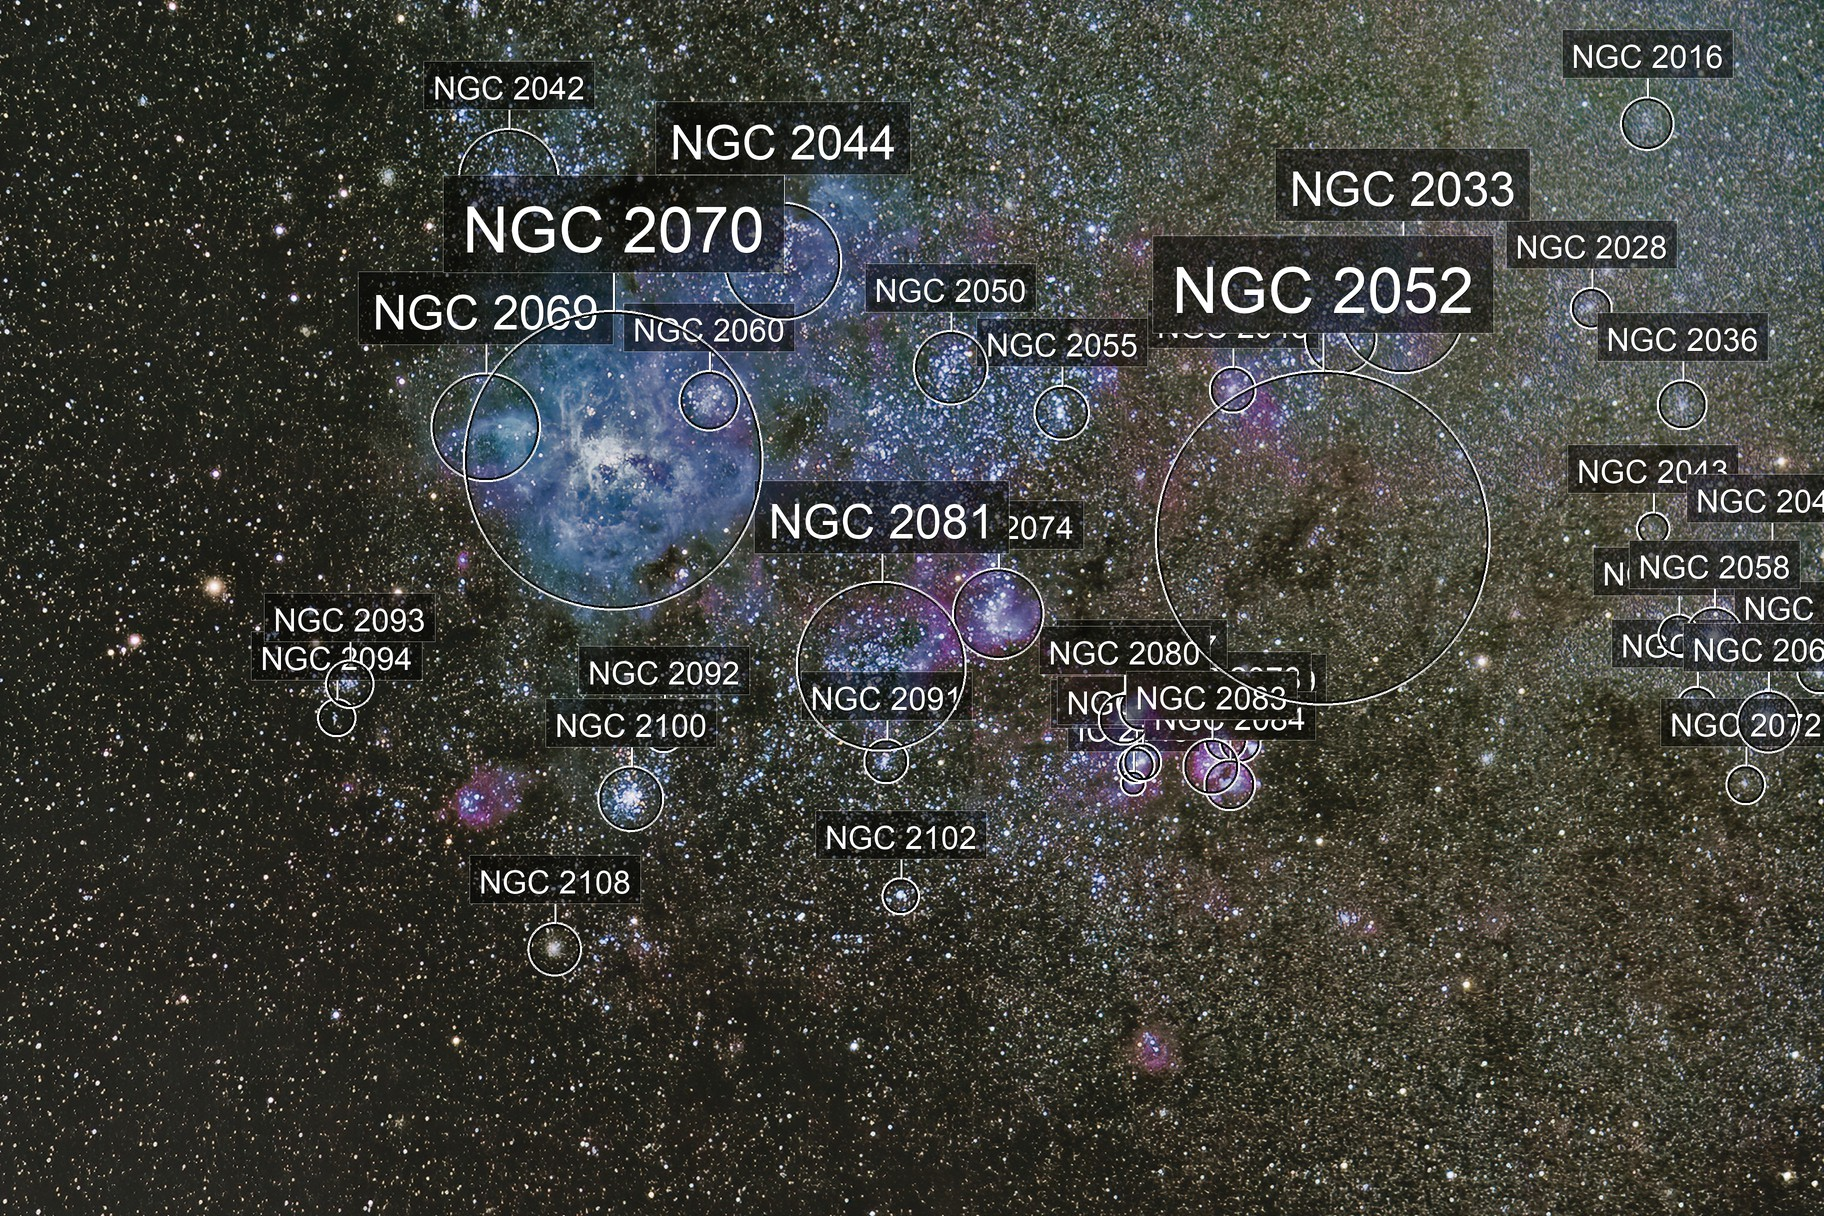 NGC 2070 (Caldwell 103) Tarantula Nebula